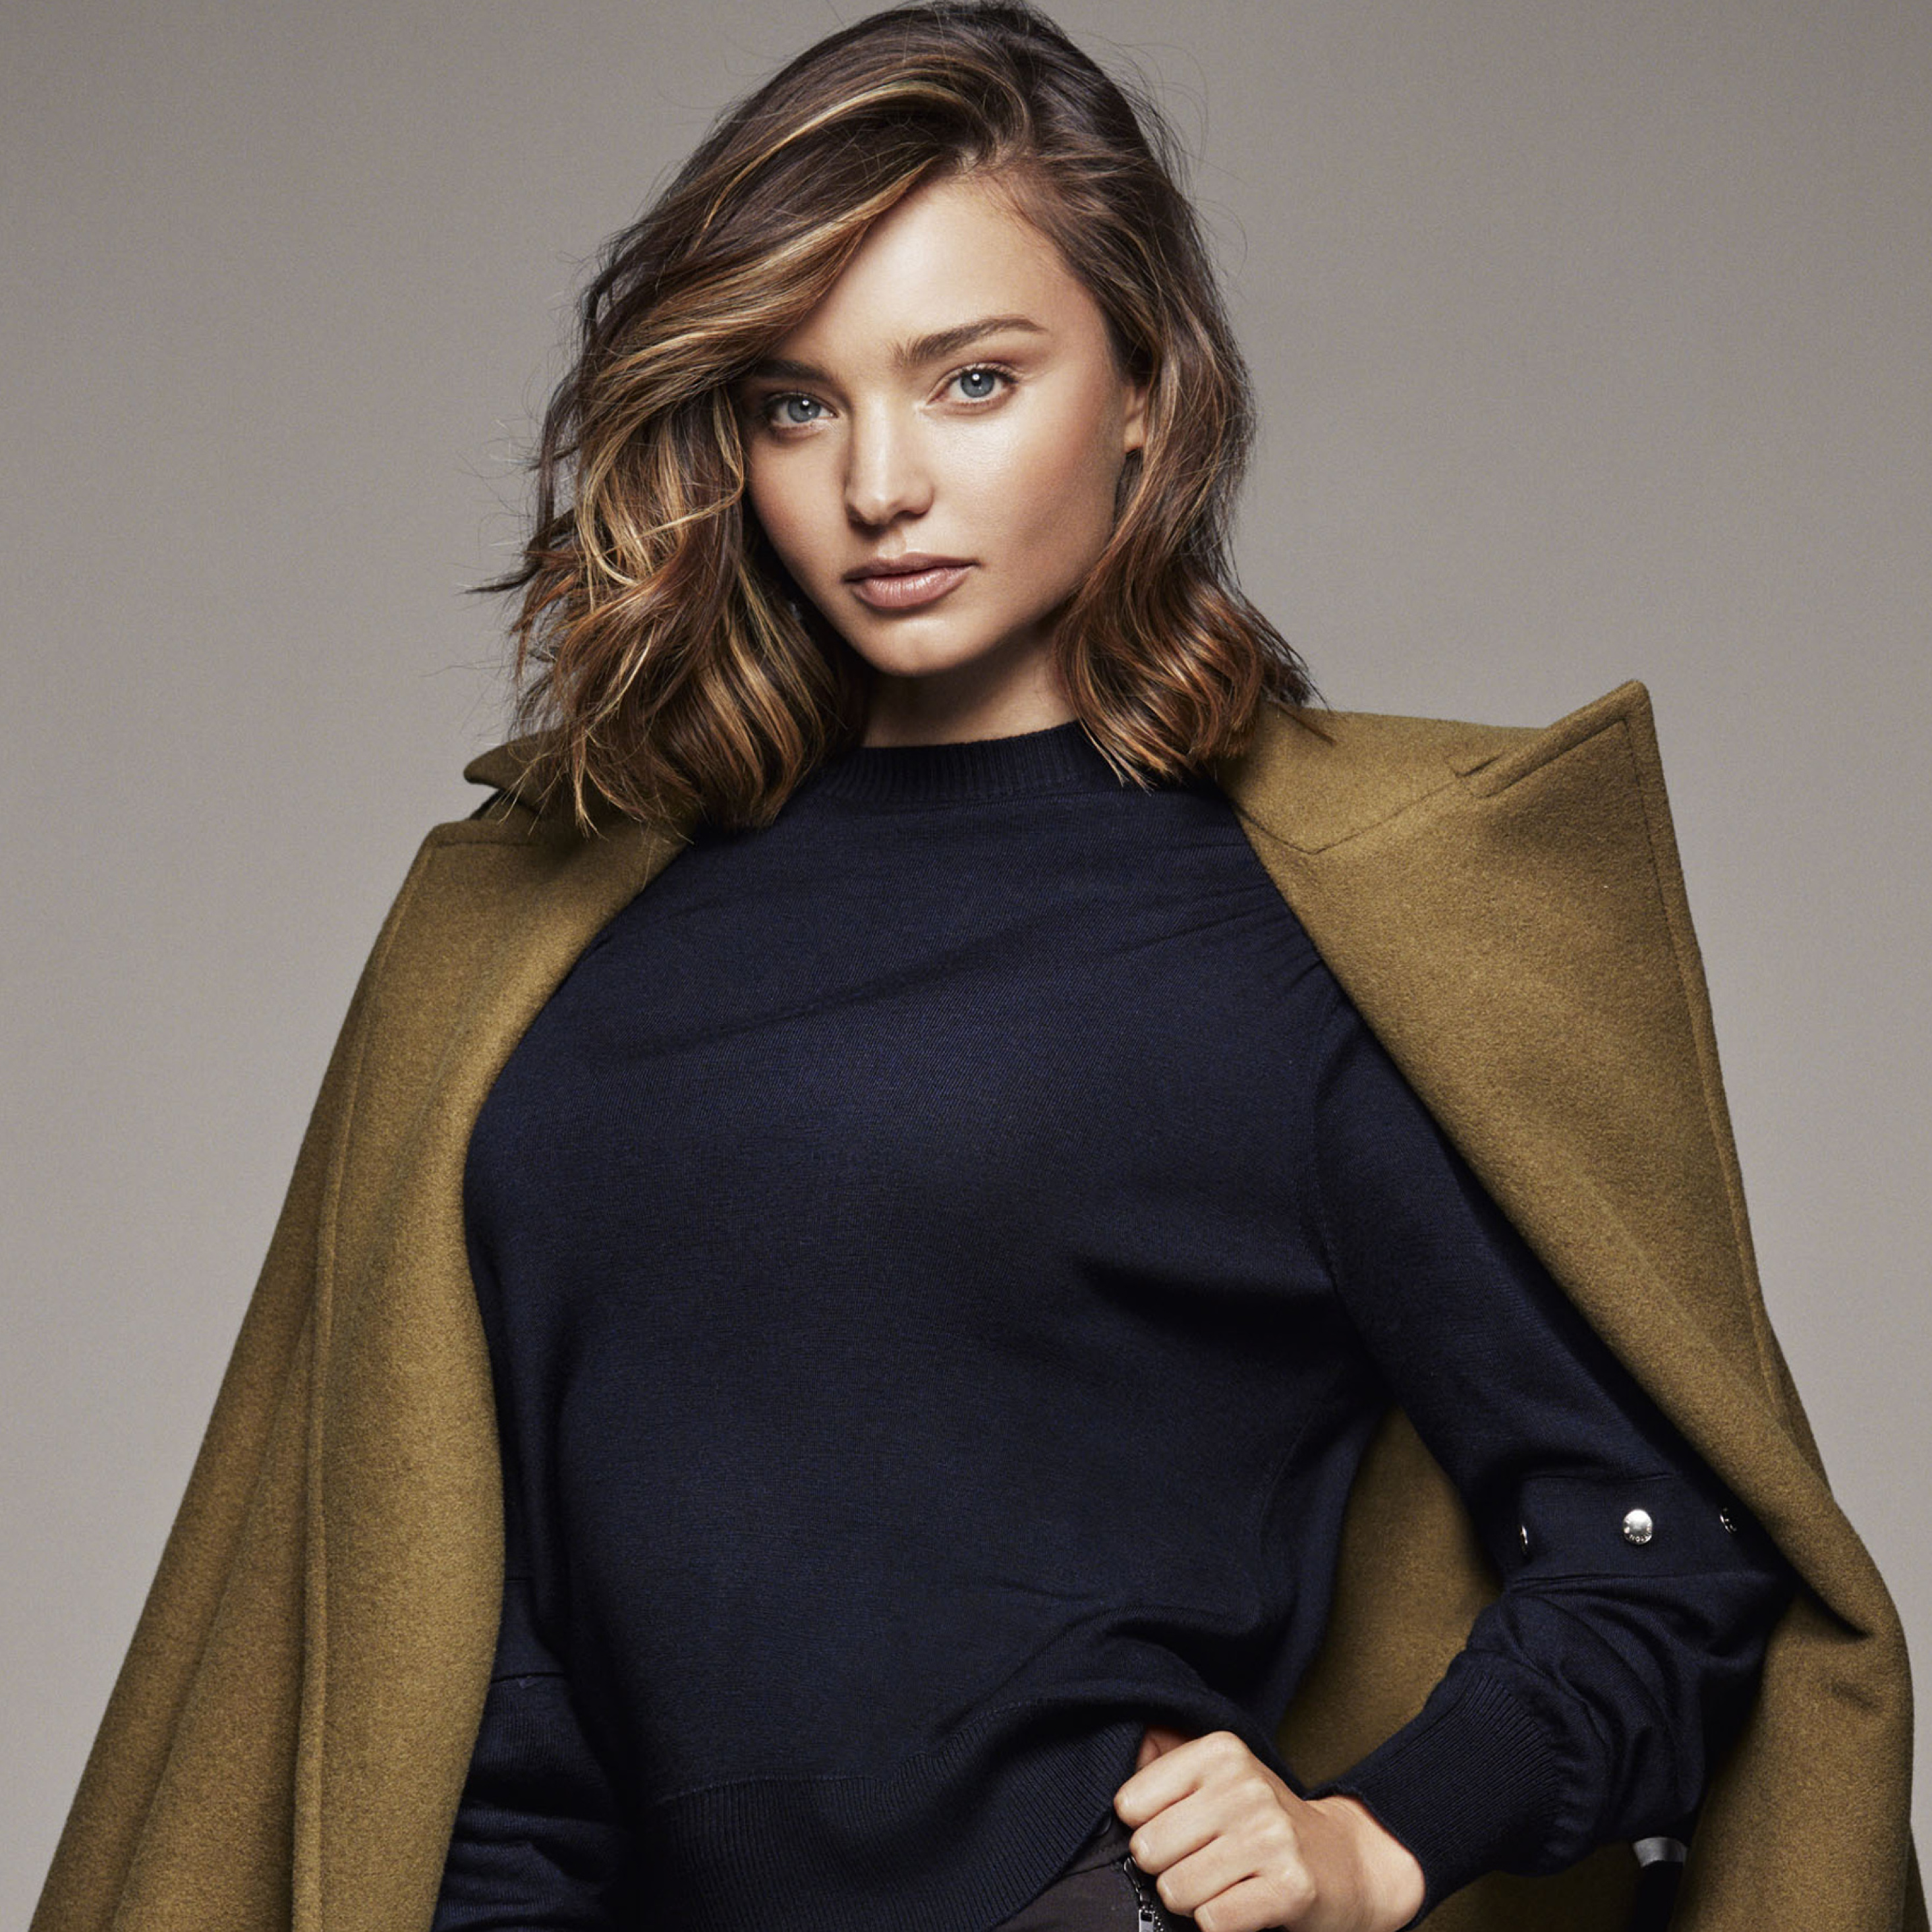 miranda kerr australian supermodel full hd 2k wallpaper